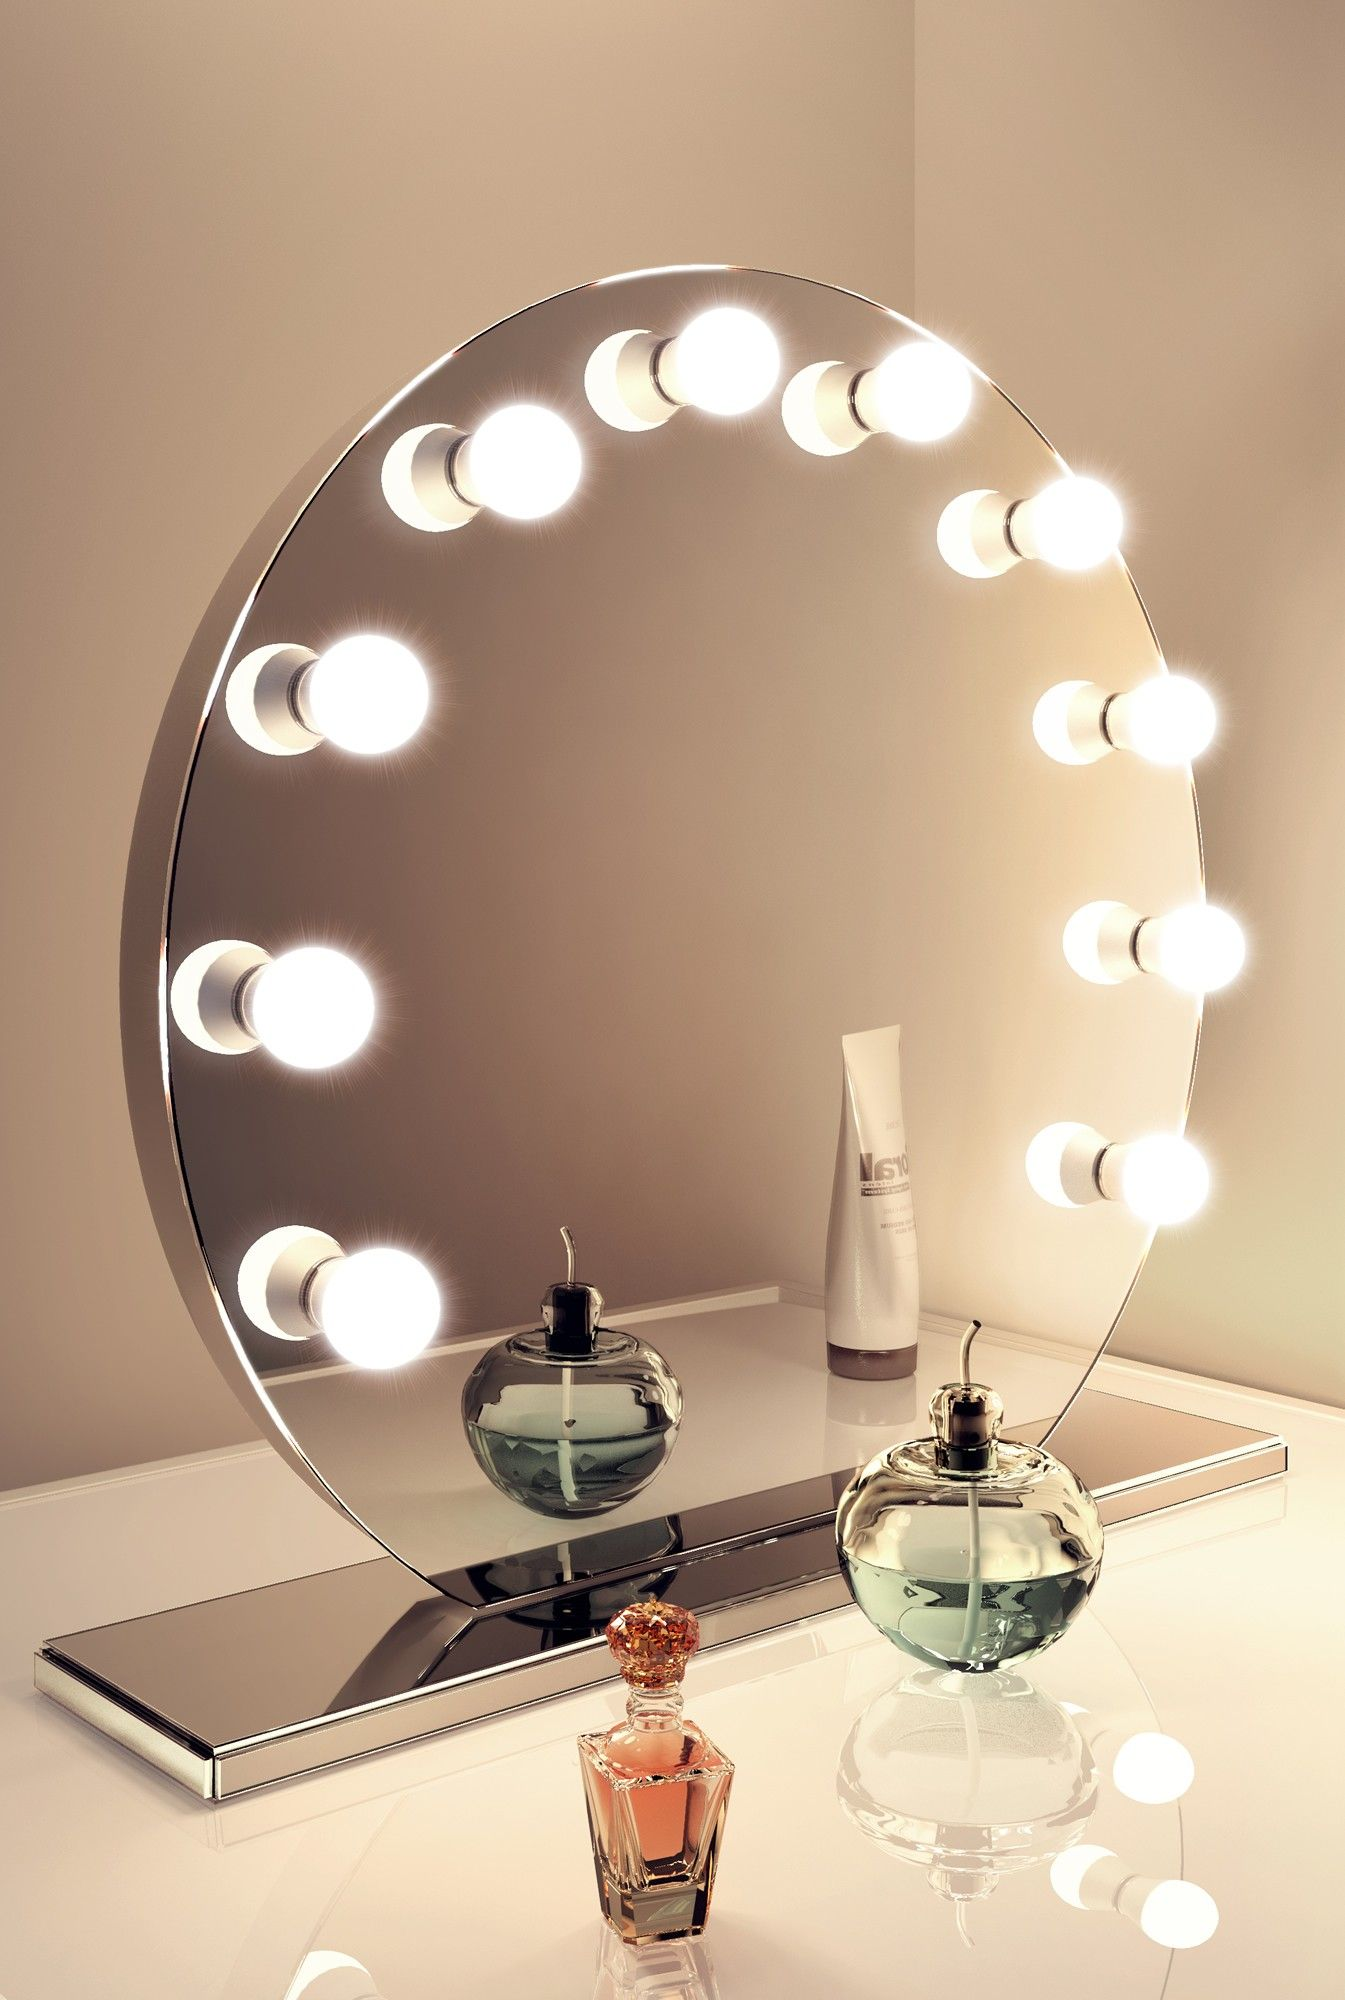 Mirror Finish Hollywood | Table Top | Dia:700mm x Depth:60mm - Illuminated Mirrors